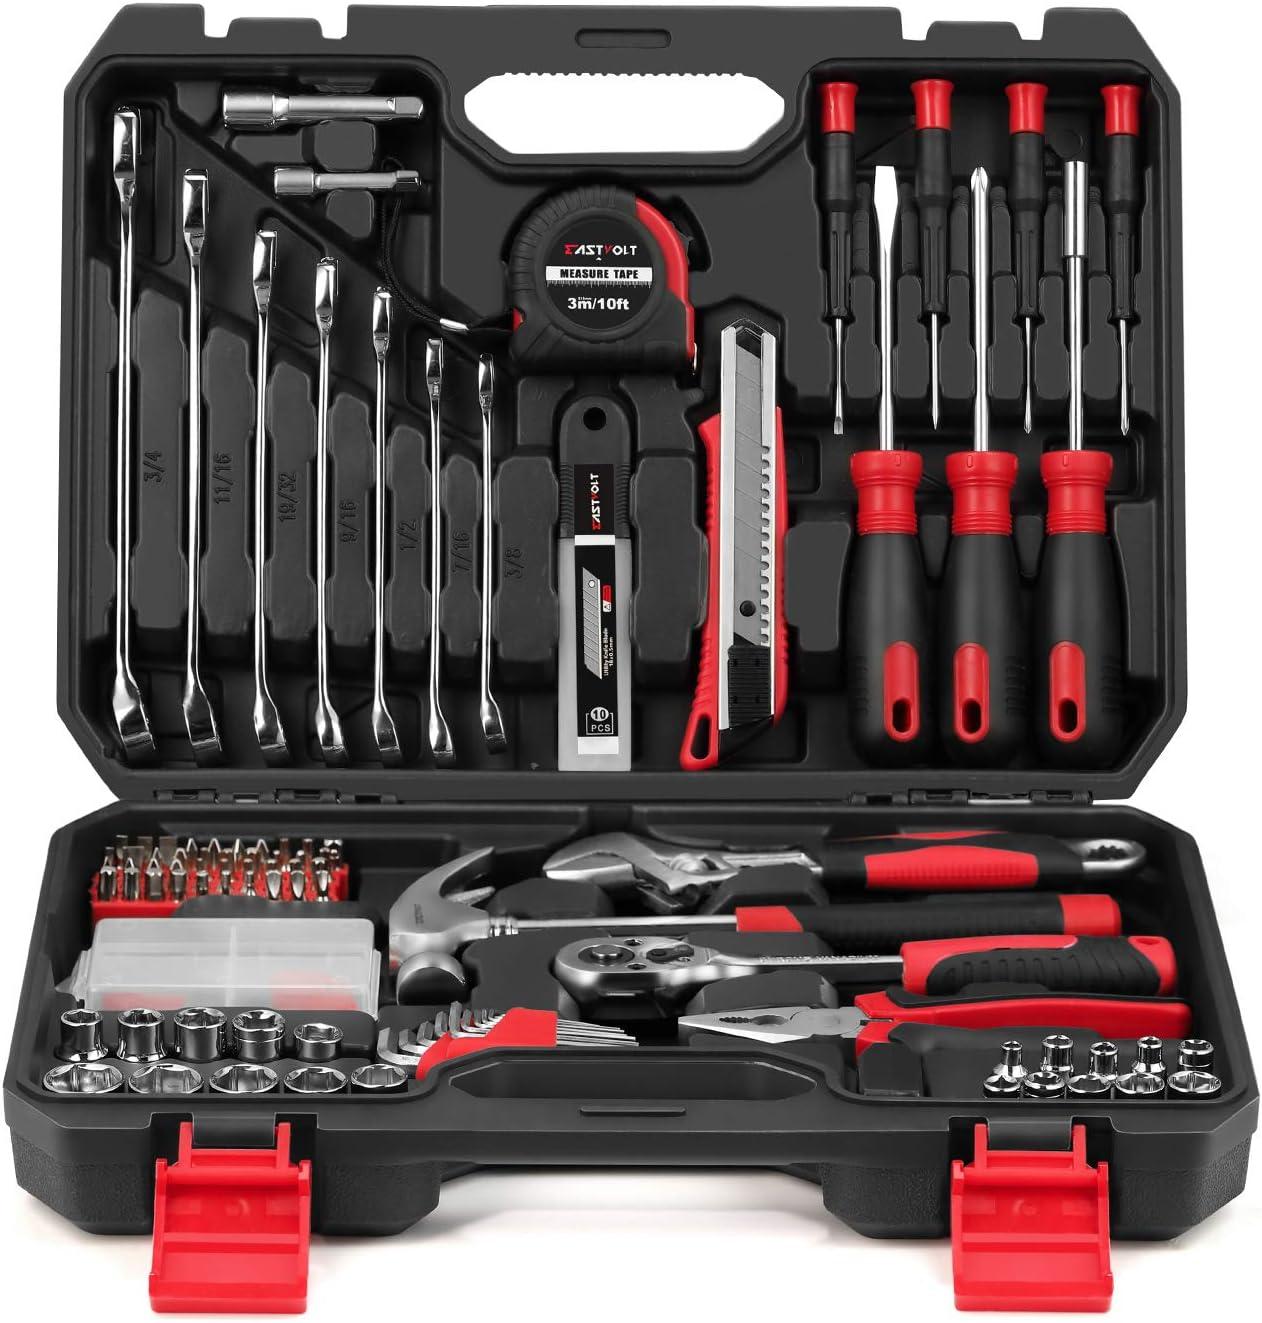 158-Piece Home Repair Tool Set, EASTVOLT General Household Hand Tool Kit,Auto Repair Tool Set, with Storage Tool Box, EVHT15801